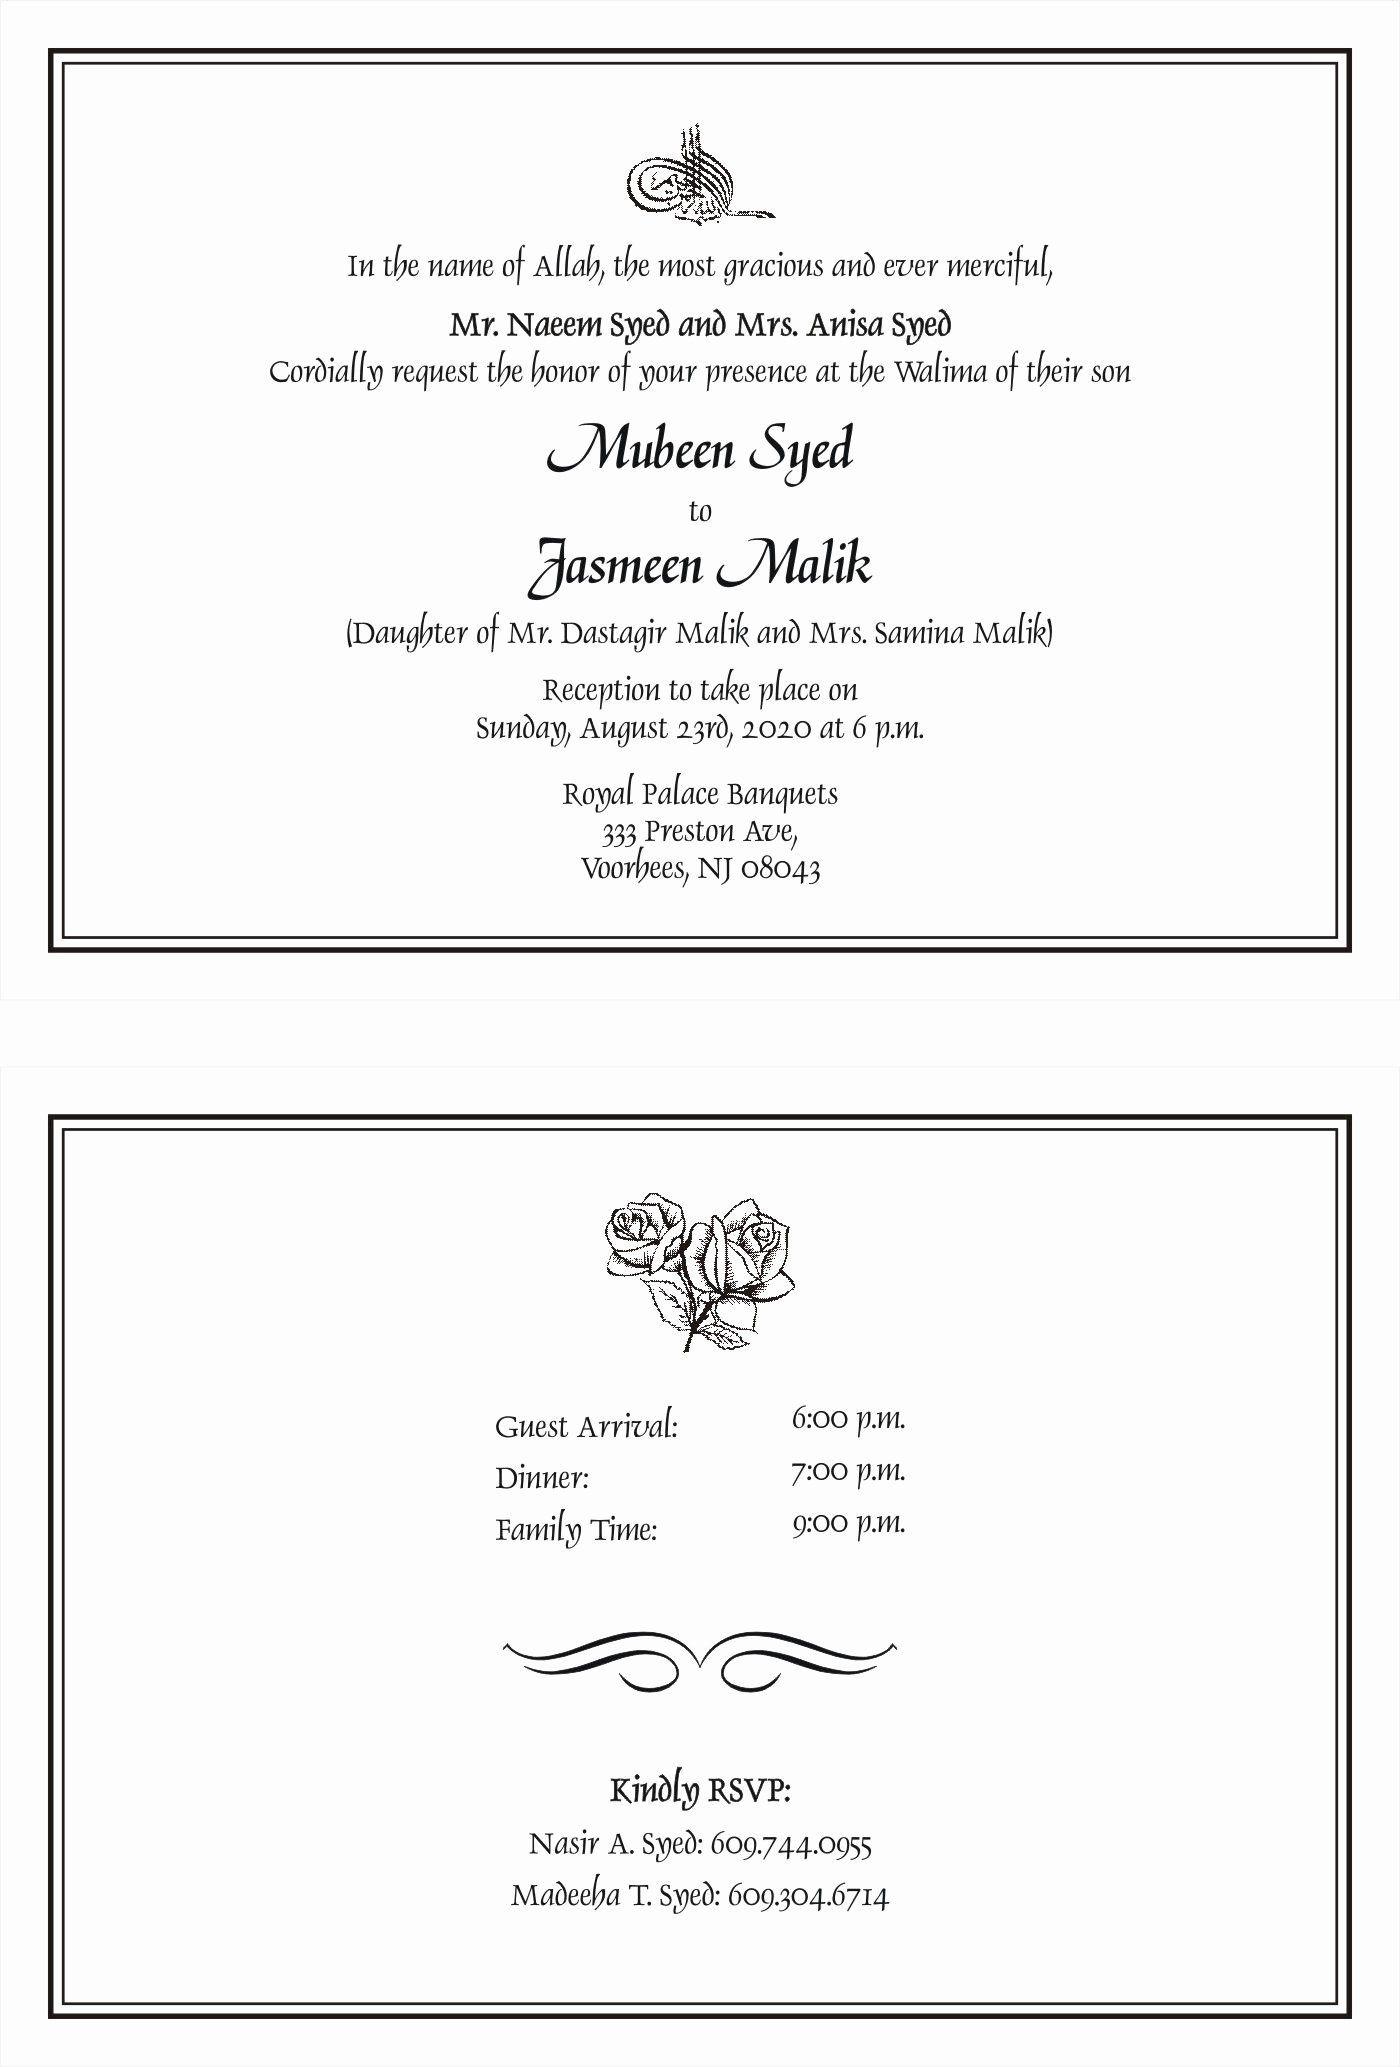 Walima Invitation Cards Wordings Beautiful Shaadi Cards Wordings Muslim Wedding Invitations Wedding Card Wordings Muslim Wedding Cards